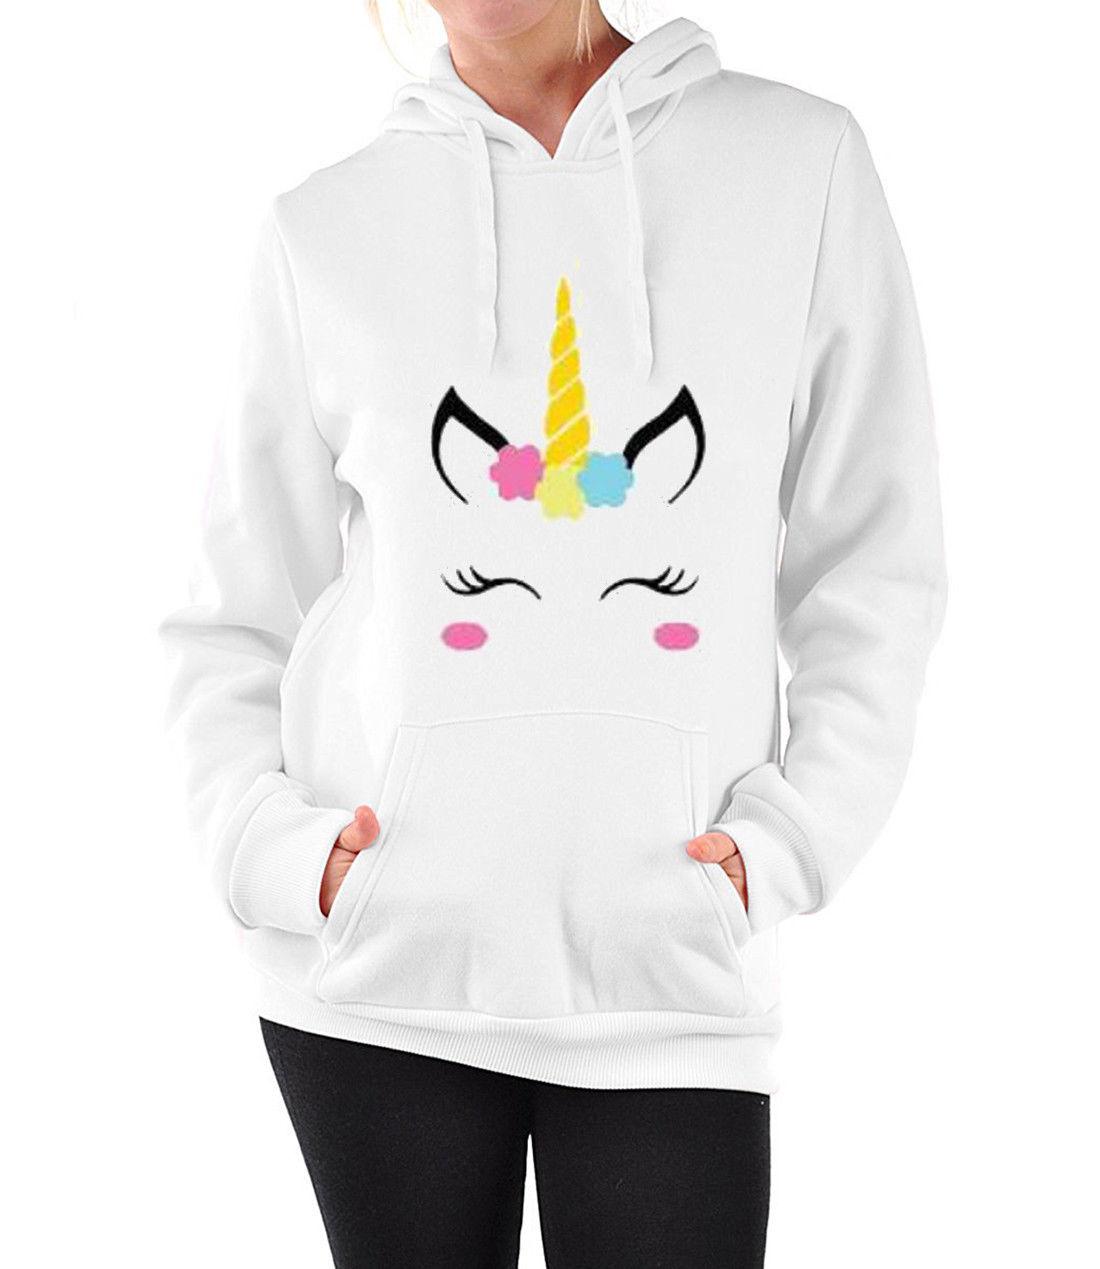 2017 Autumn Women Ladies Girl Sweet Unicorn Printed Hoodie Sweatshirt Long Sleeve Pull Pocket Licorne Harajuku Fleece Clothes